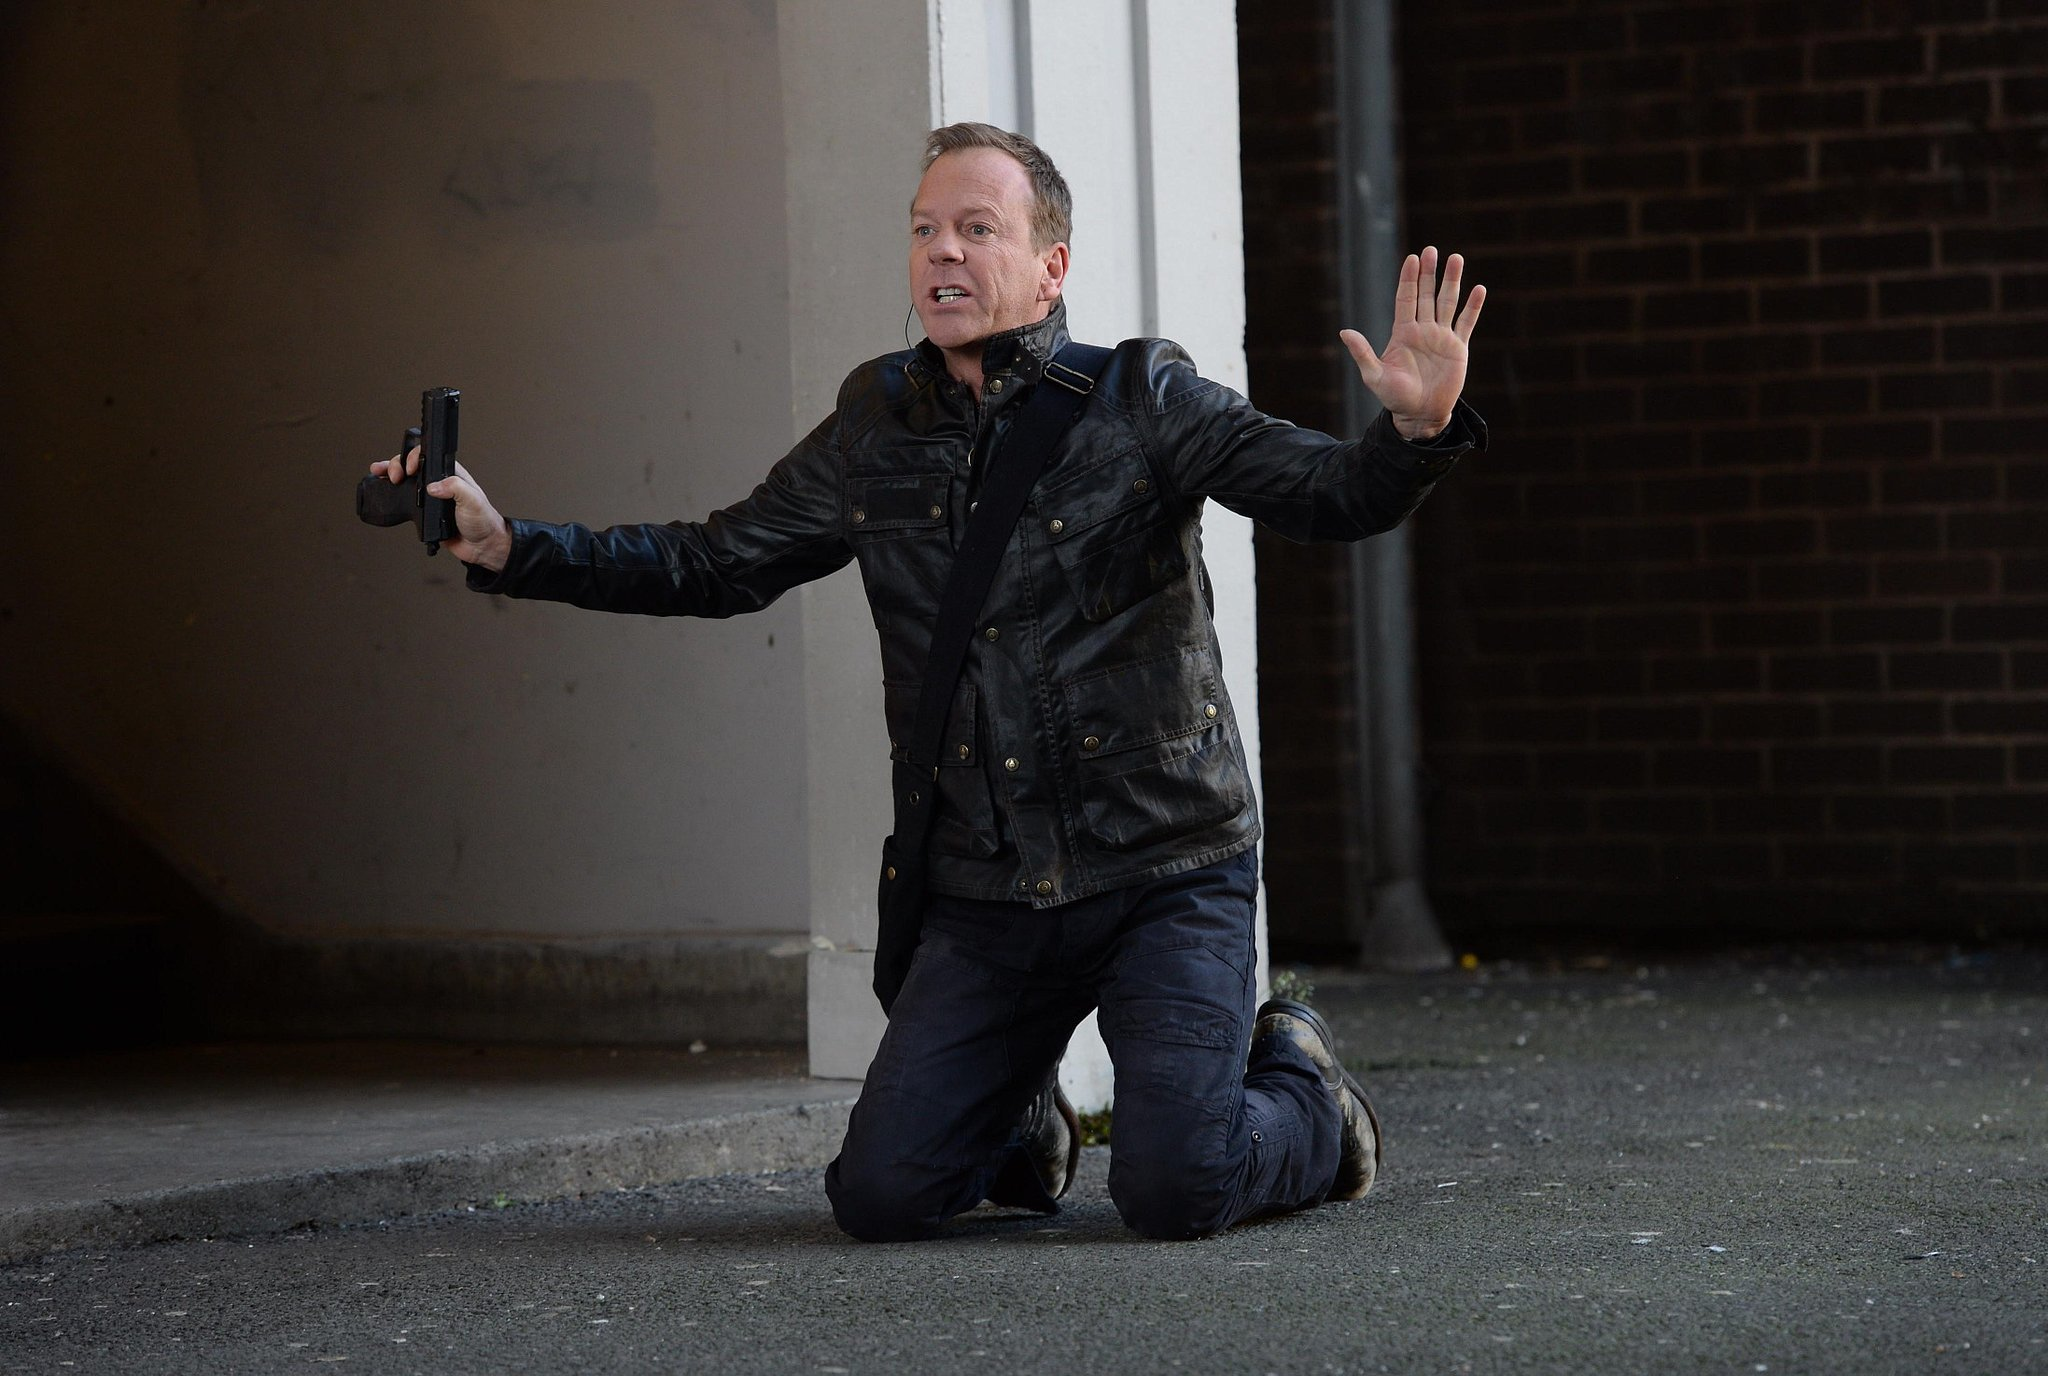 Kiefer Sutherland takes a knee as Jack Bauer.